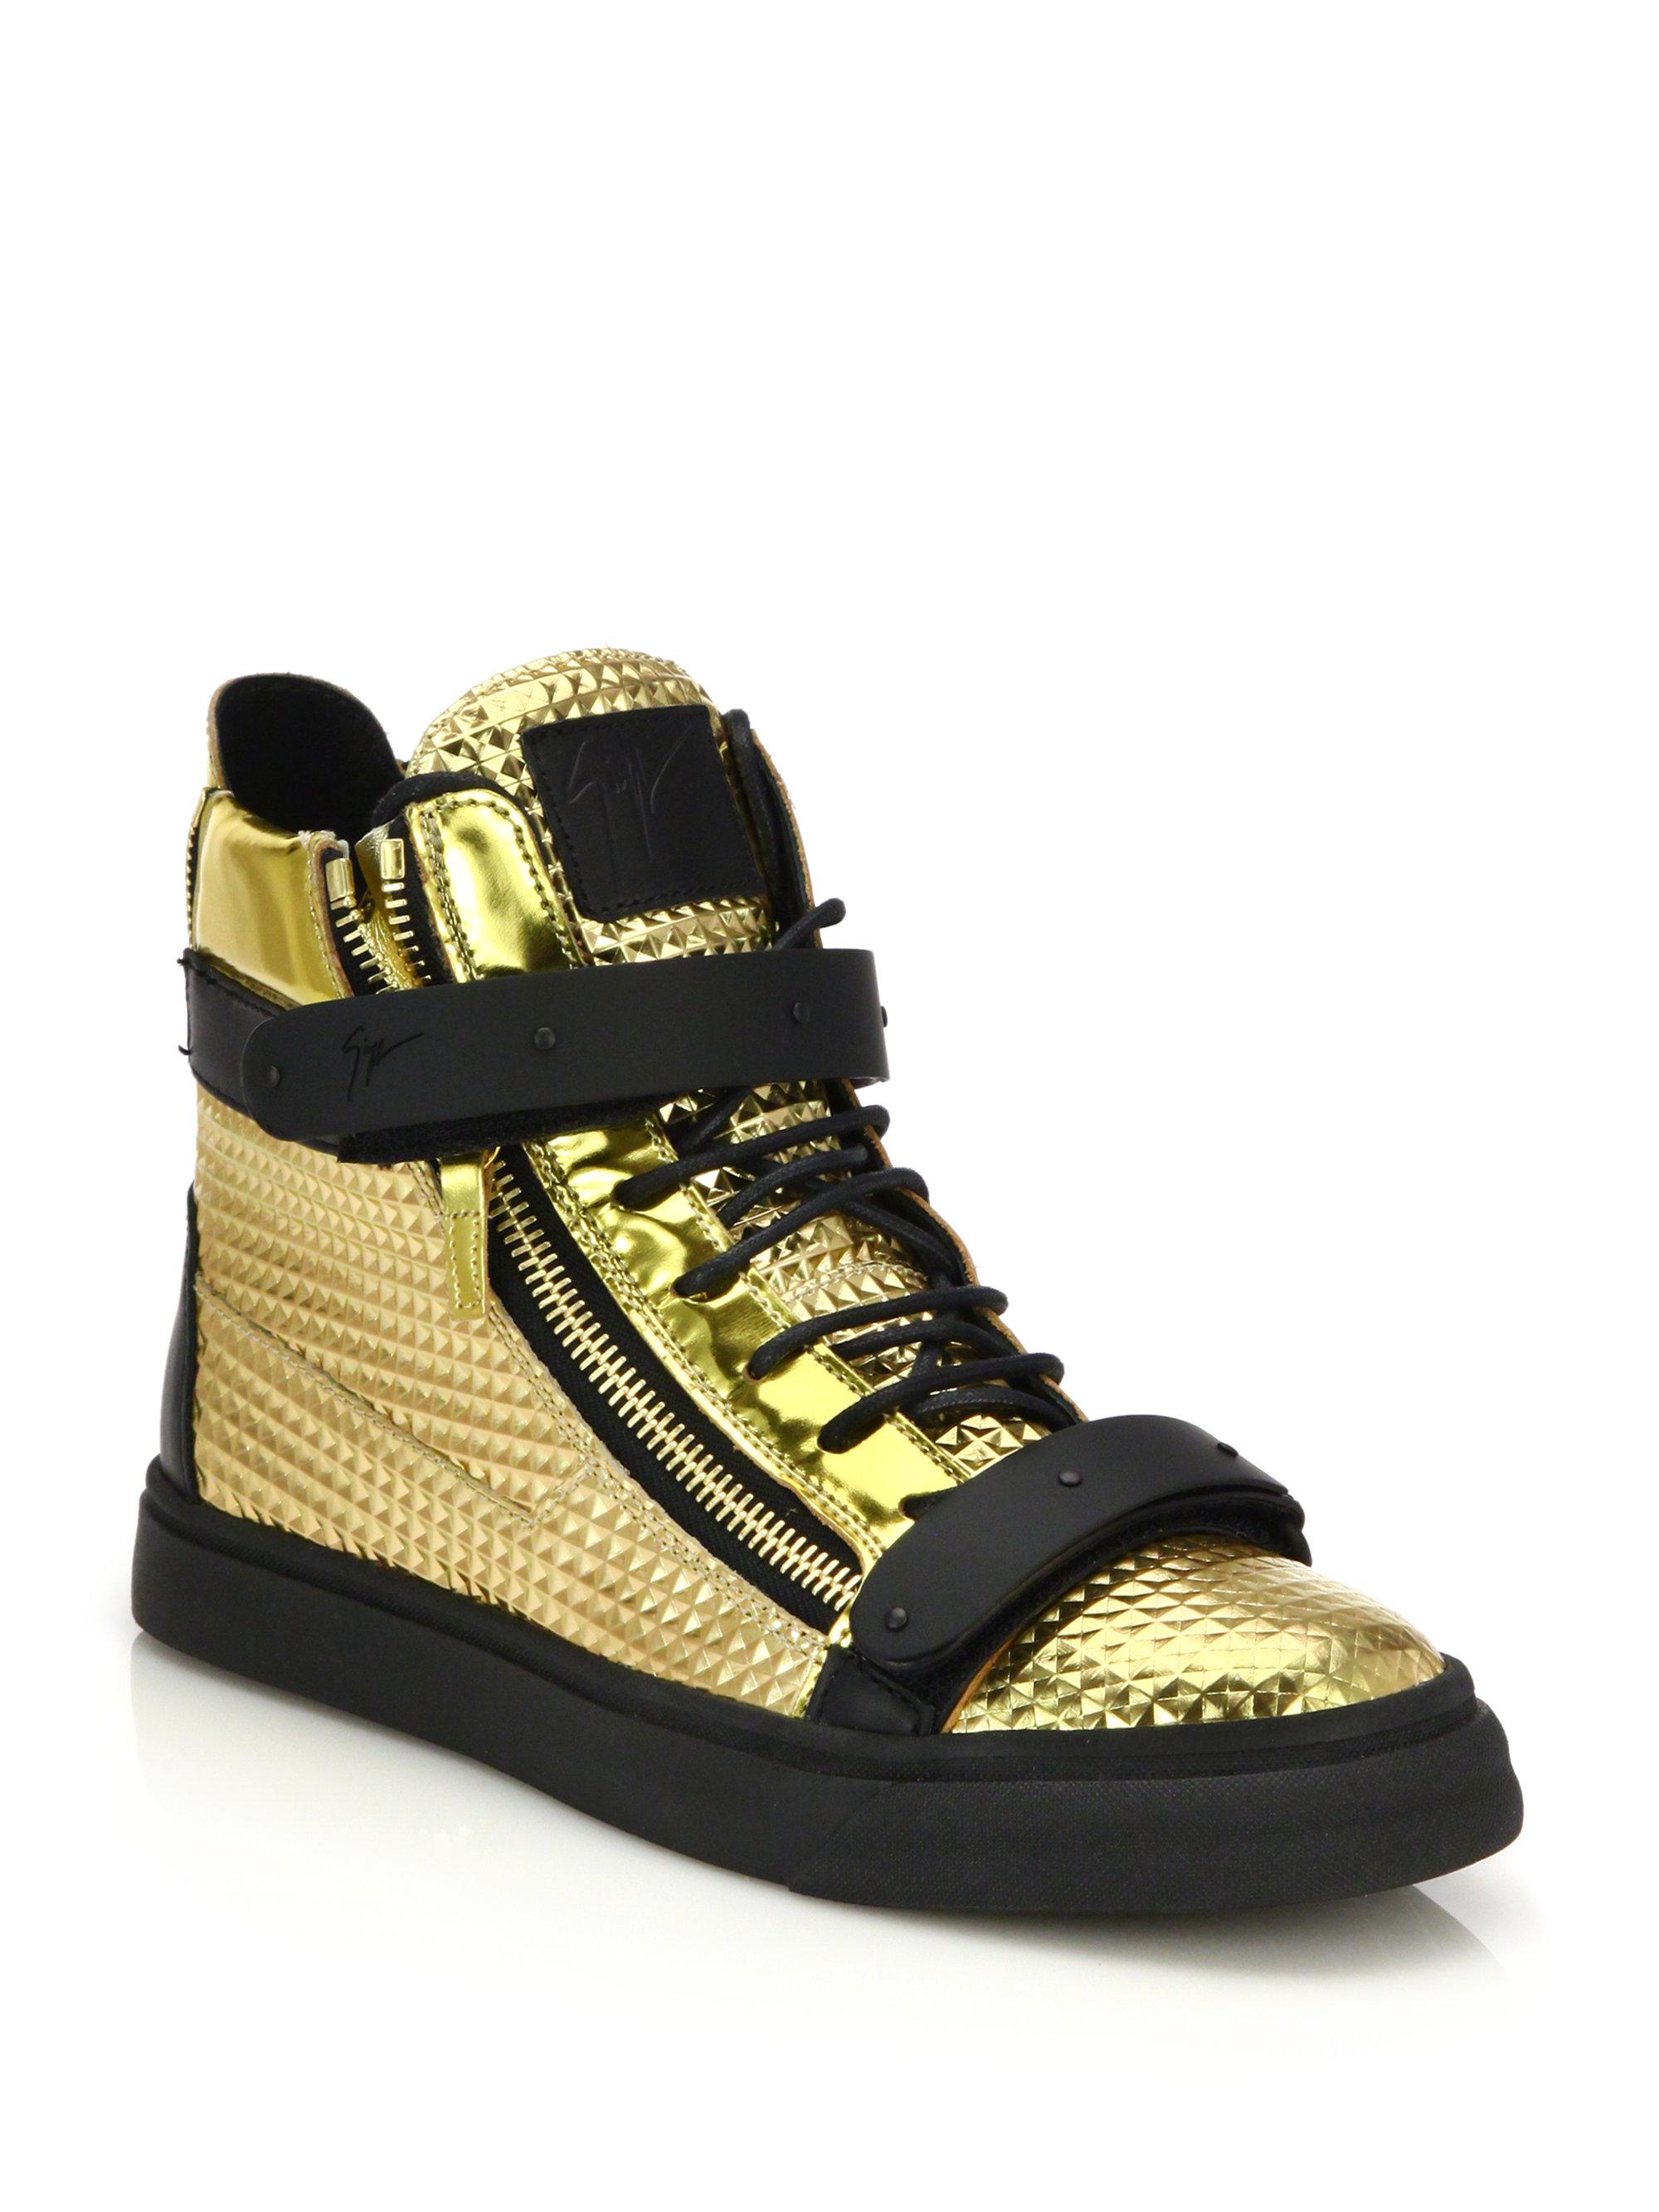 giuseppe zanotti sneakers gold. Black Bedroom Furniture Sets. Home Design Ideas